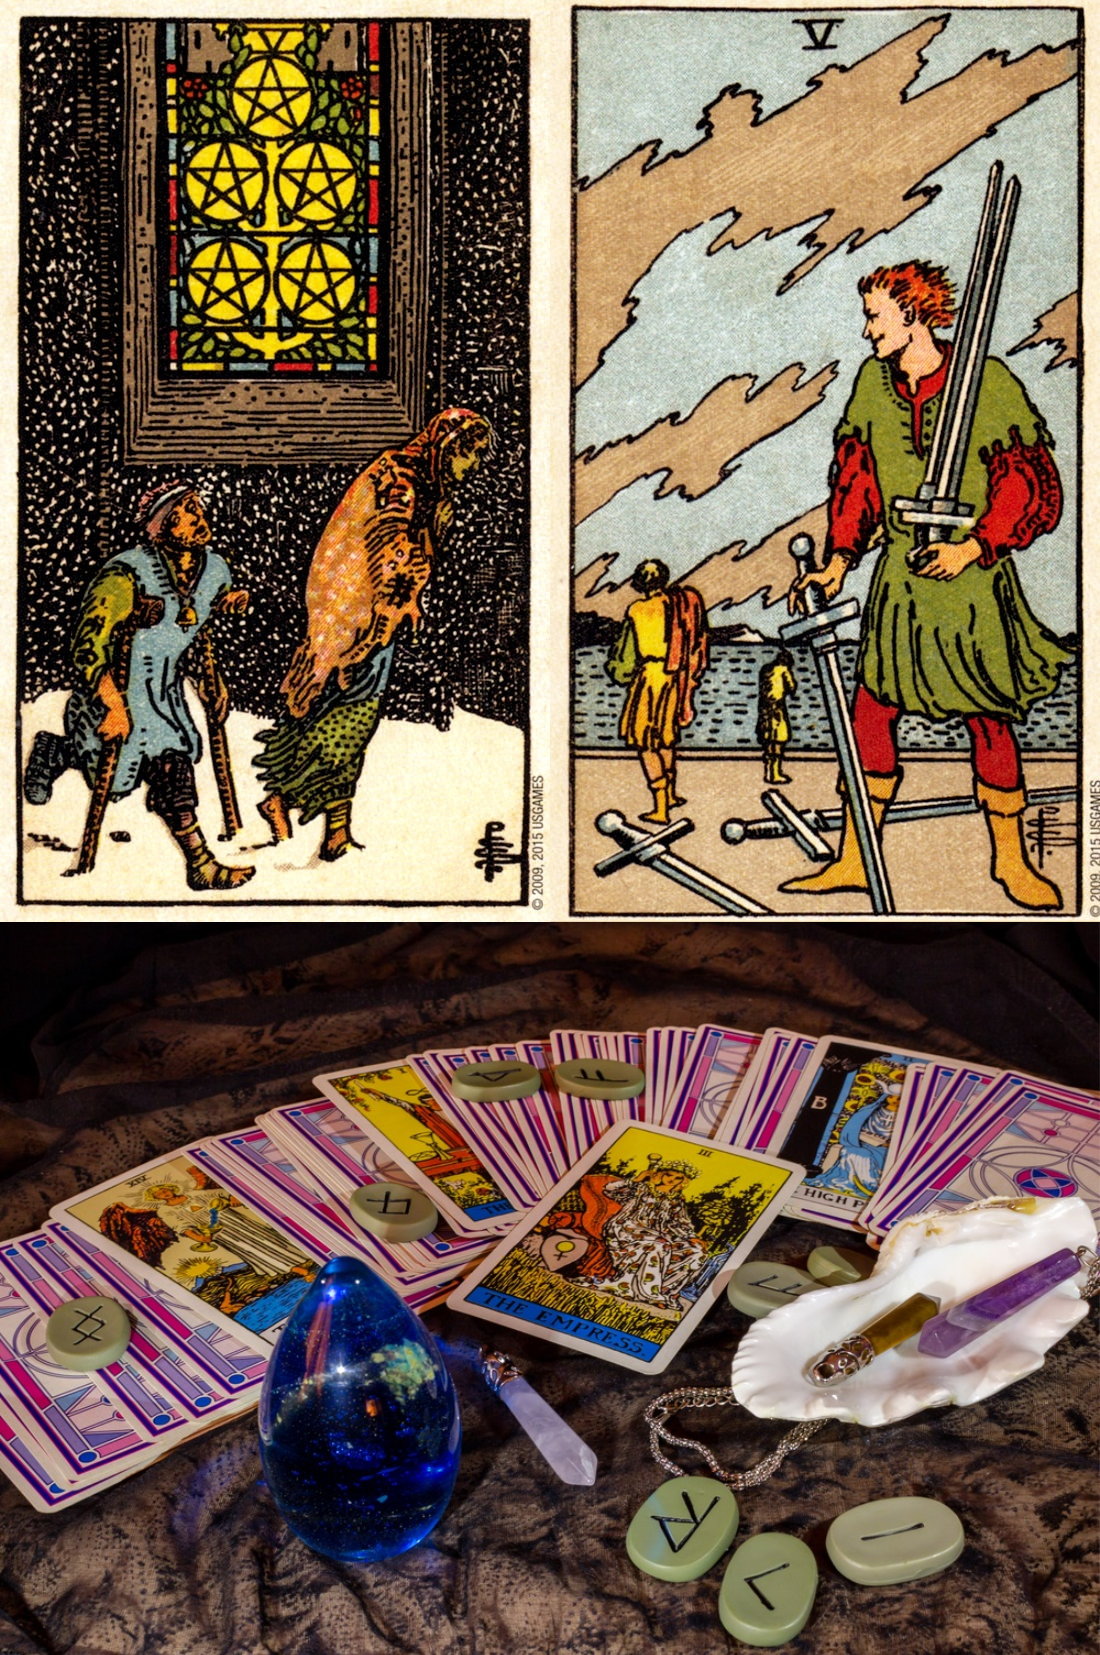 free latin tarot card reading, read my cards and free tarot reading llewellyn, tarot card yes or no and traditional tarot cards.